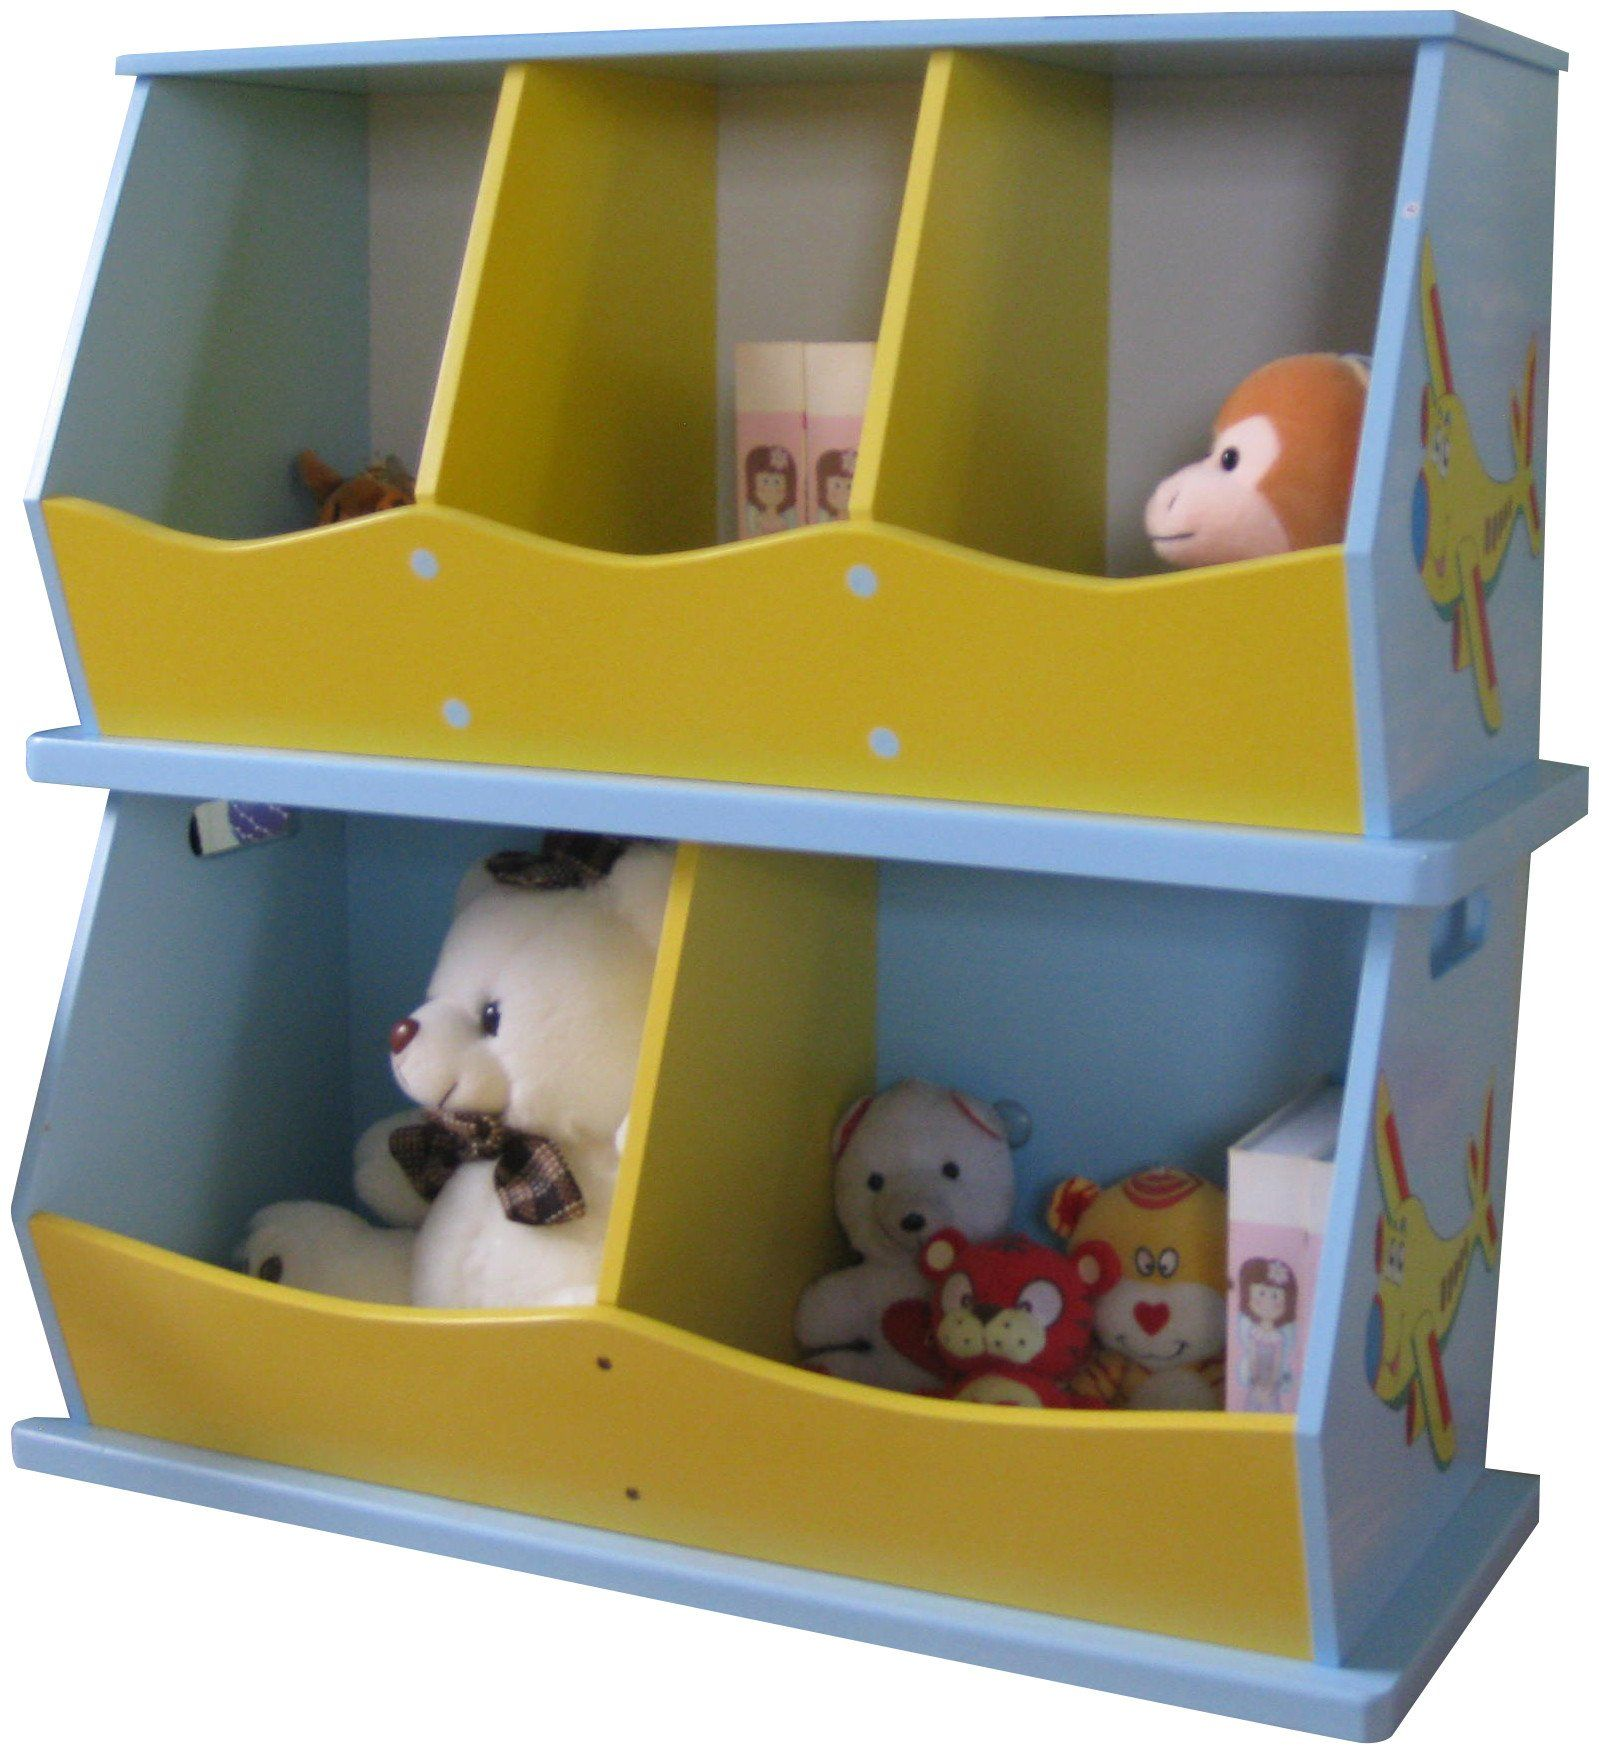 Liberty House Toys u0027Transportu0027 2-Bin Storage Unit £44.99. & Transport 2-Bin Storage Unit - STOCK TBC   Bin storage